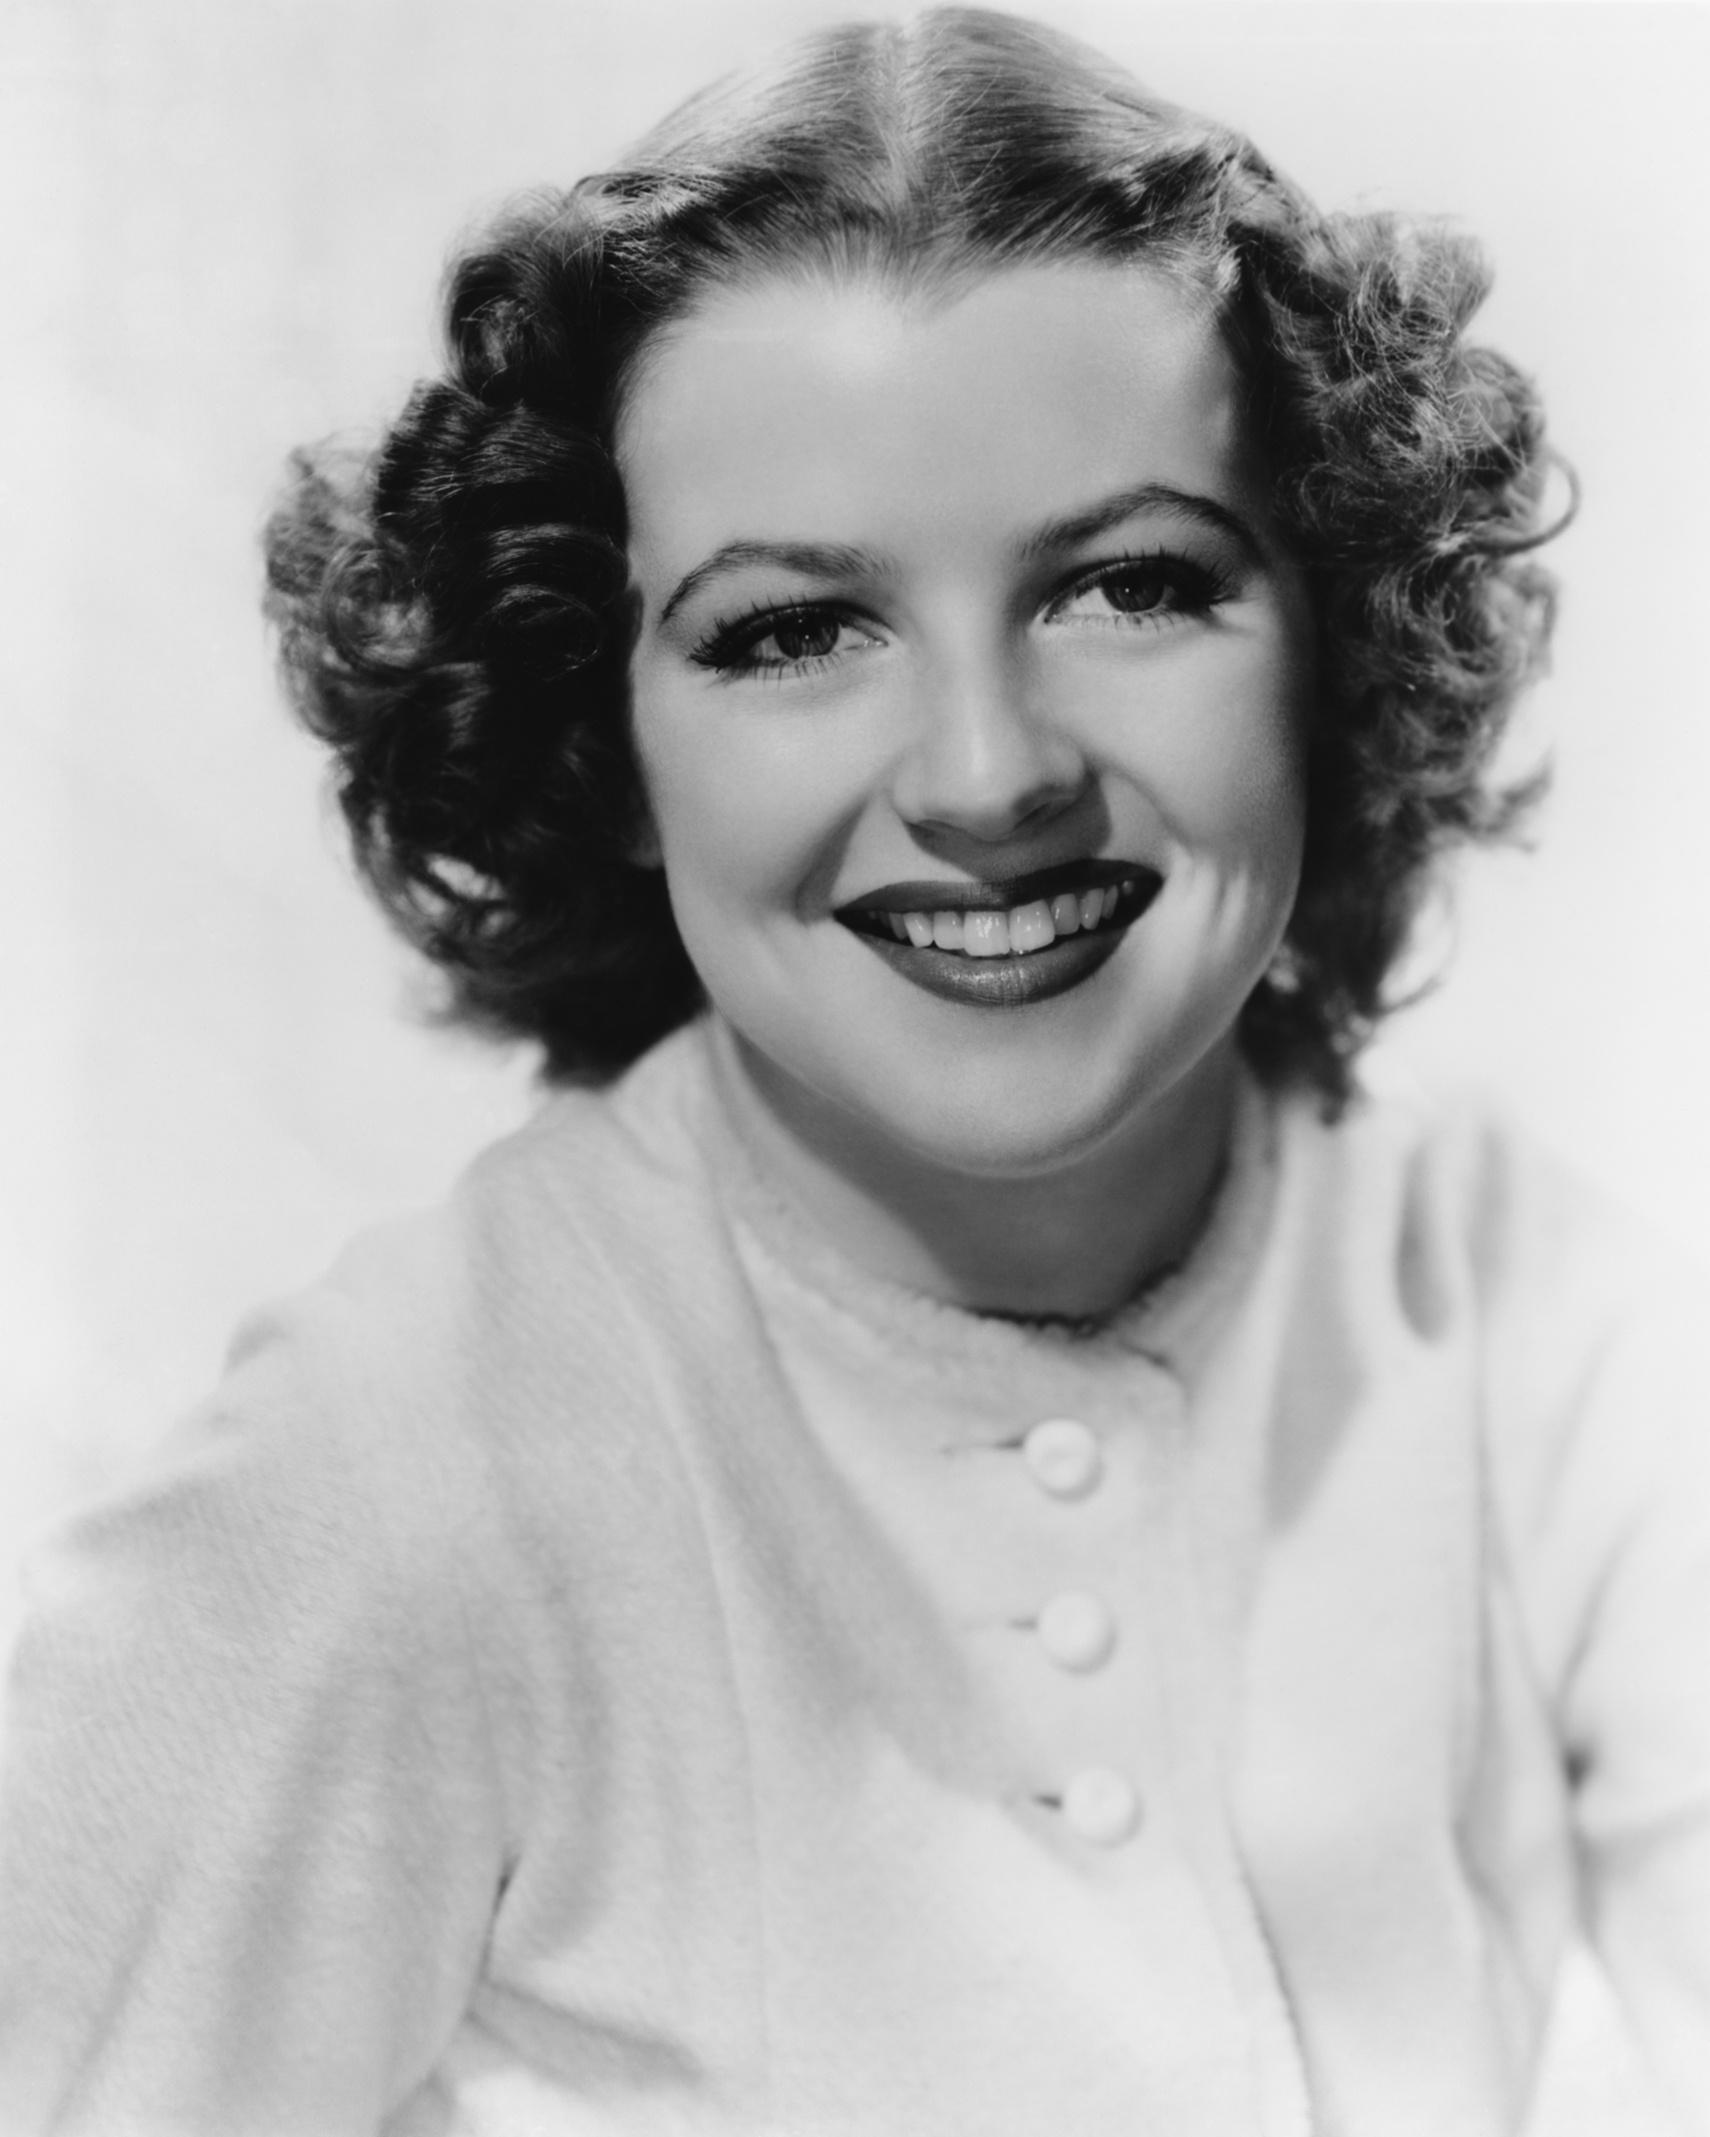 Betty Furness